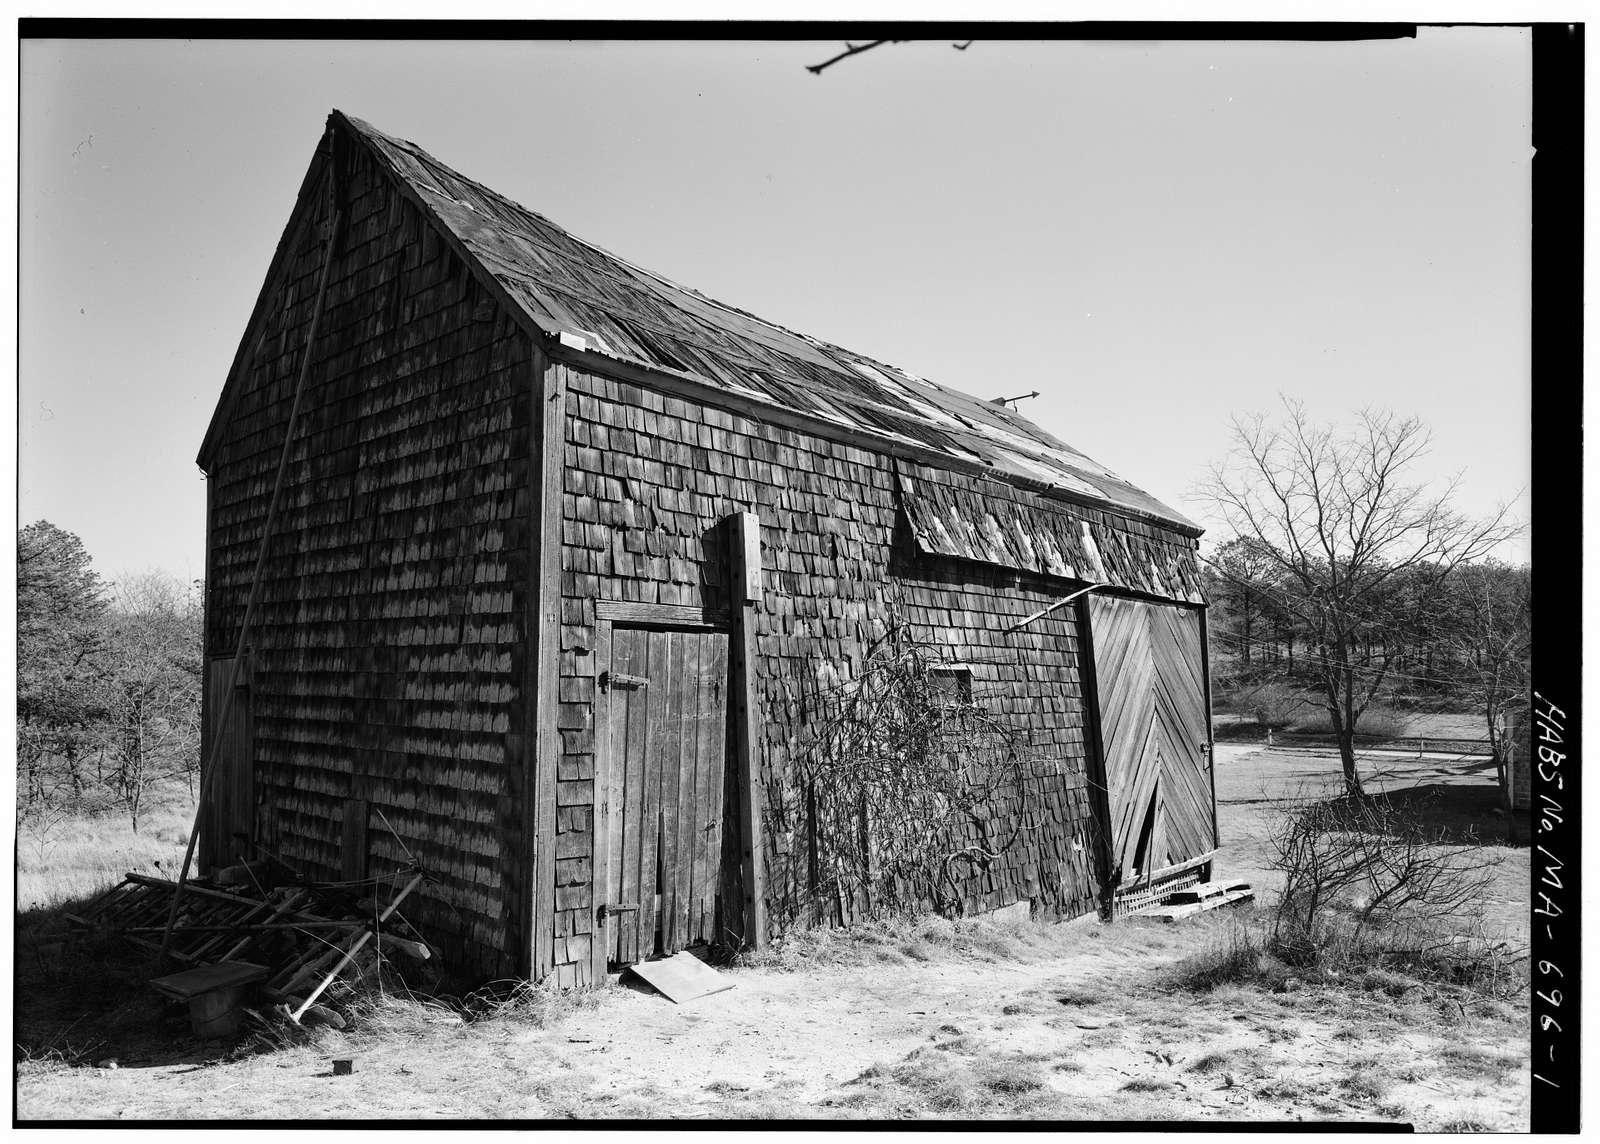 Daniel P. Higgins Barn, Higgins Hollow Road, Truro, Barnstable County, MA